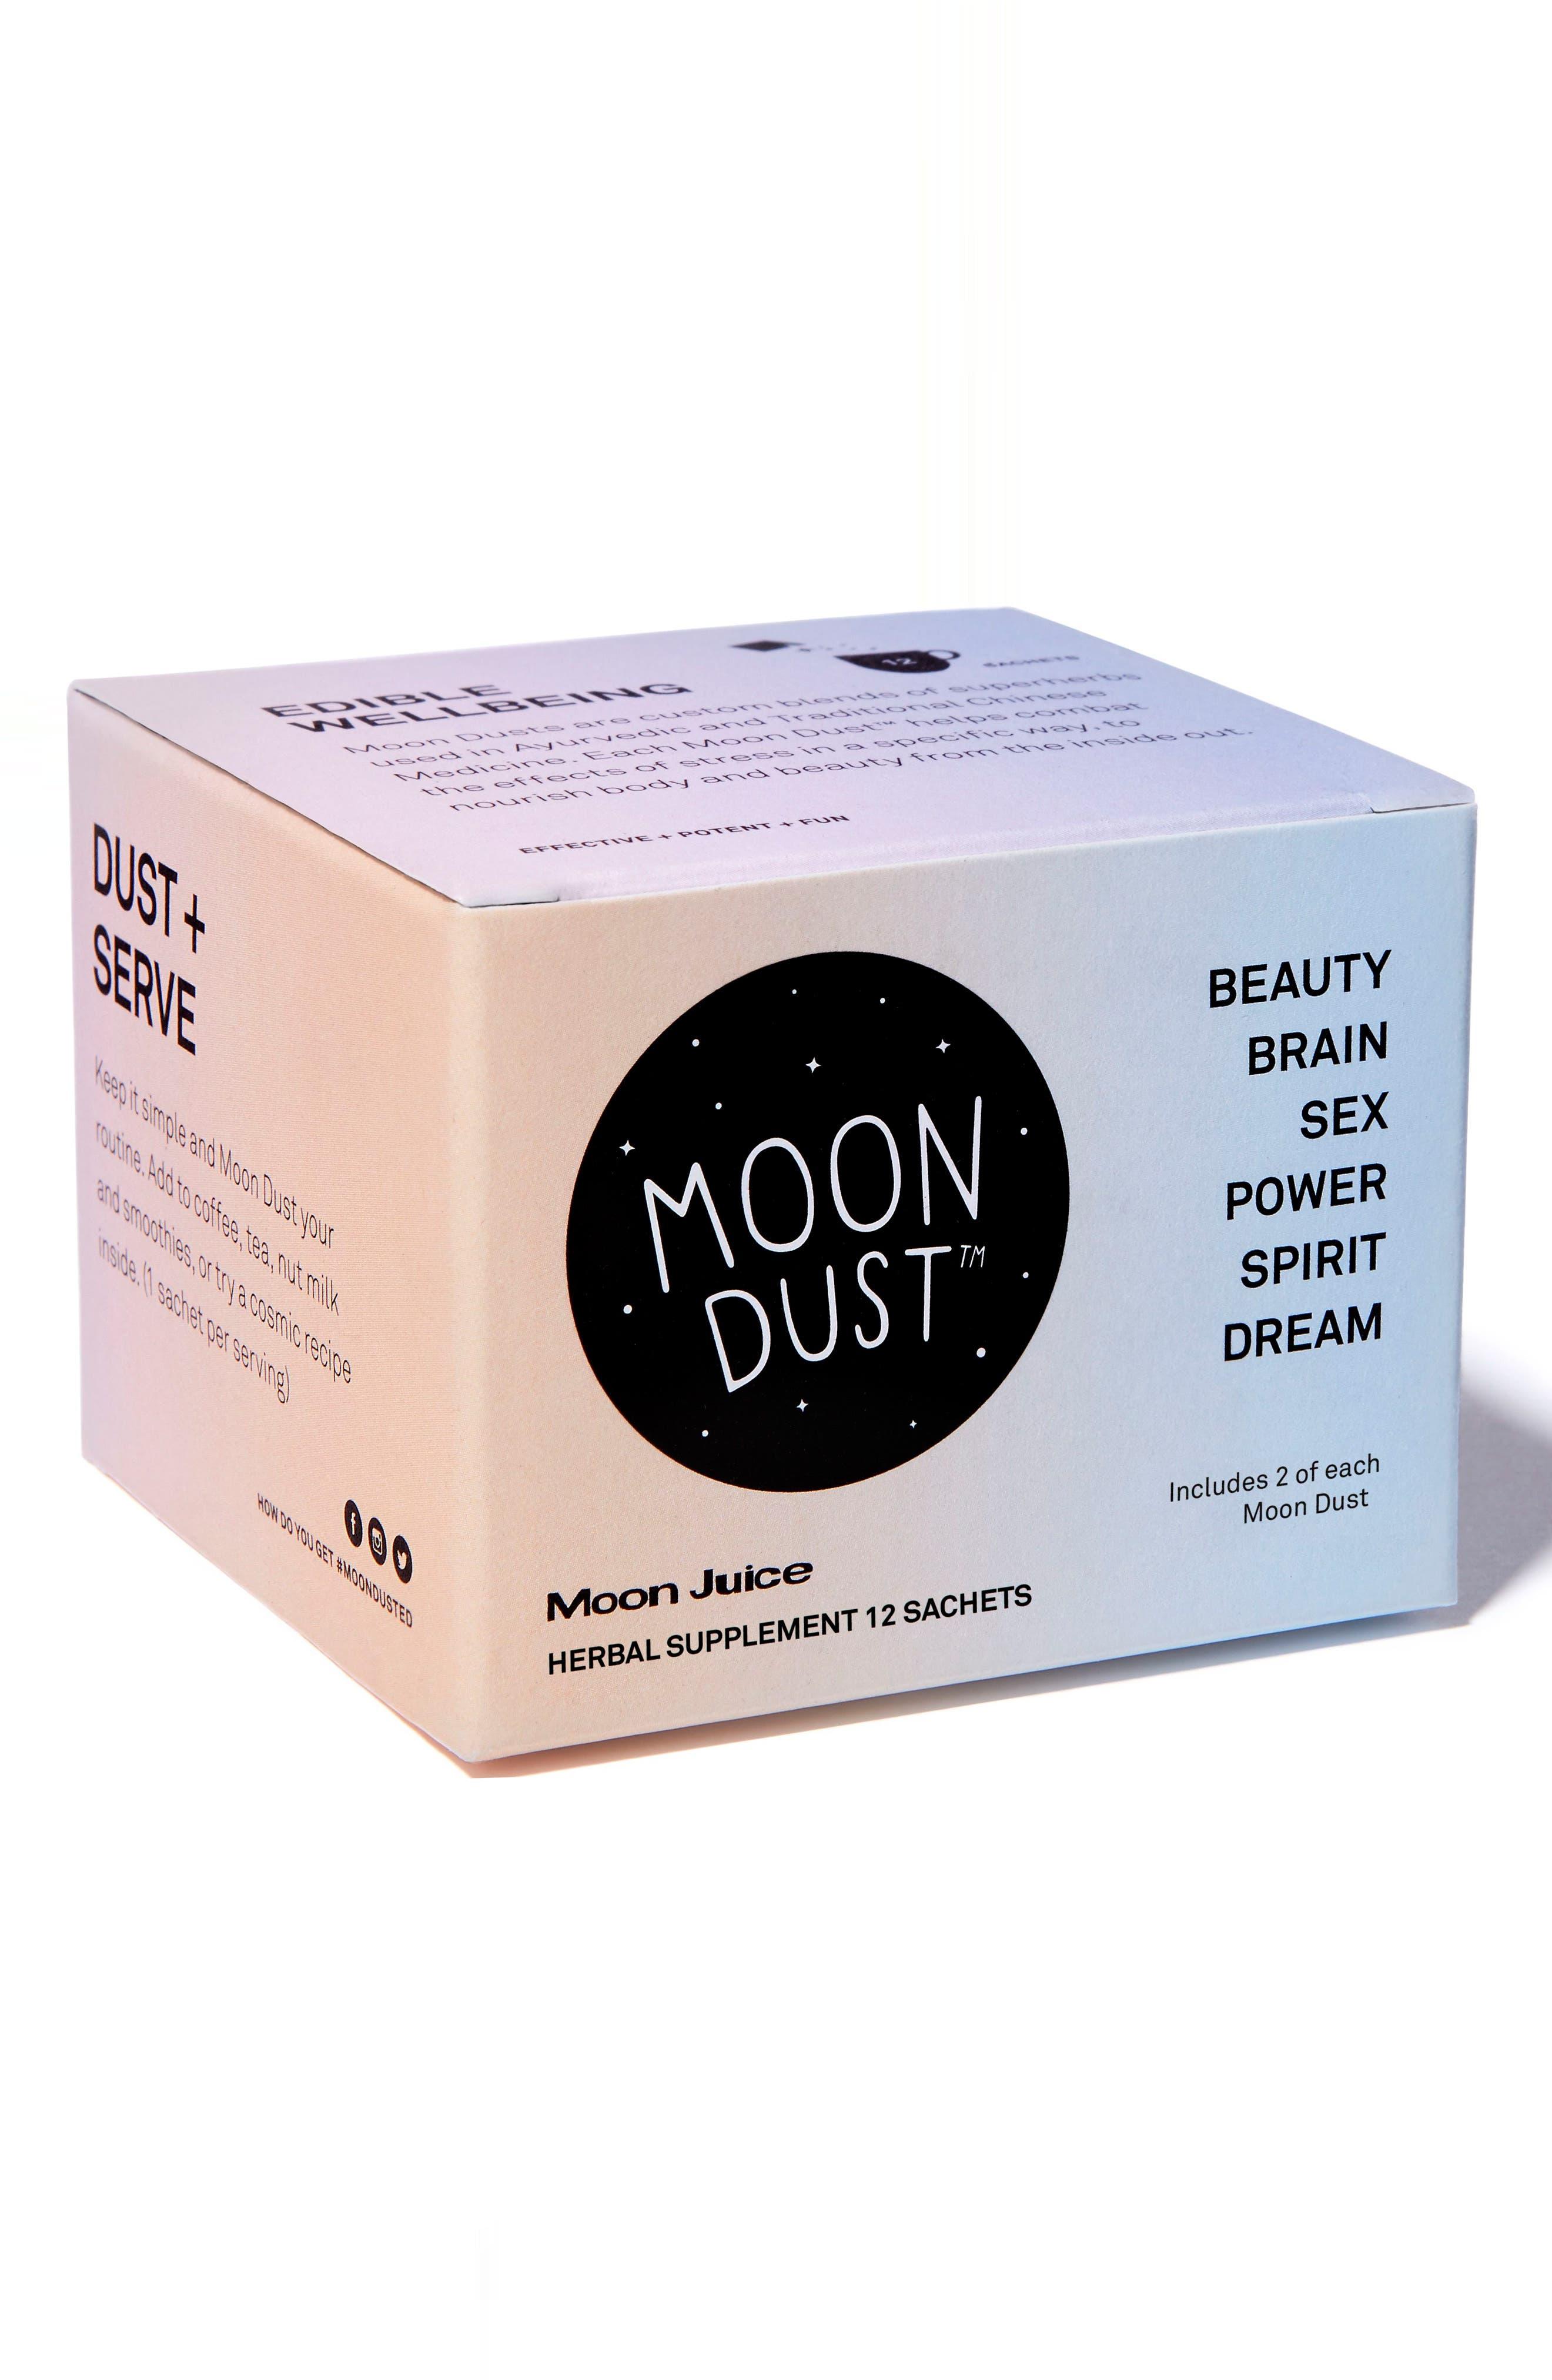 Full Moon Dust 12-Pack Sachet Box,                         Main,                         color, No Color